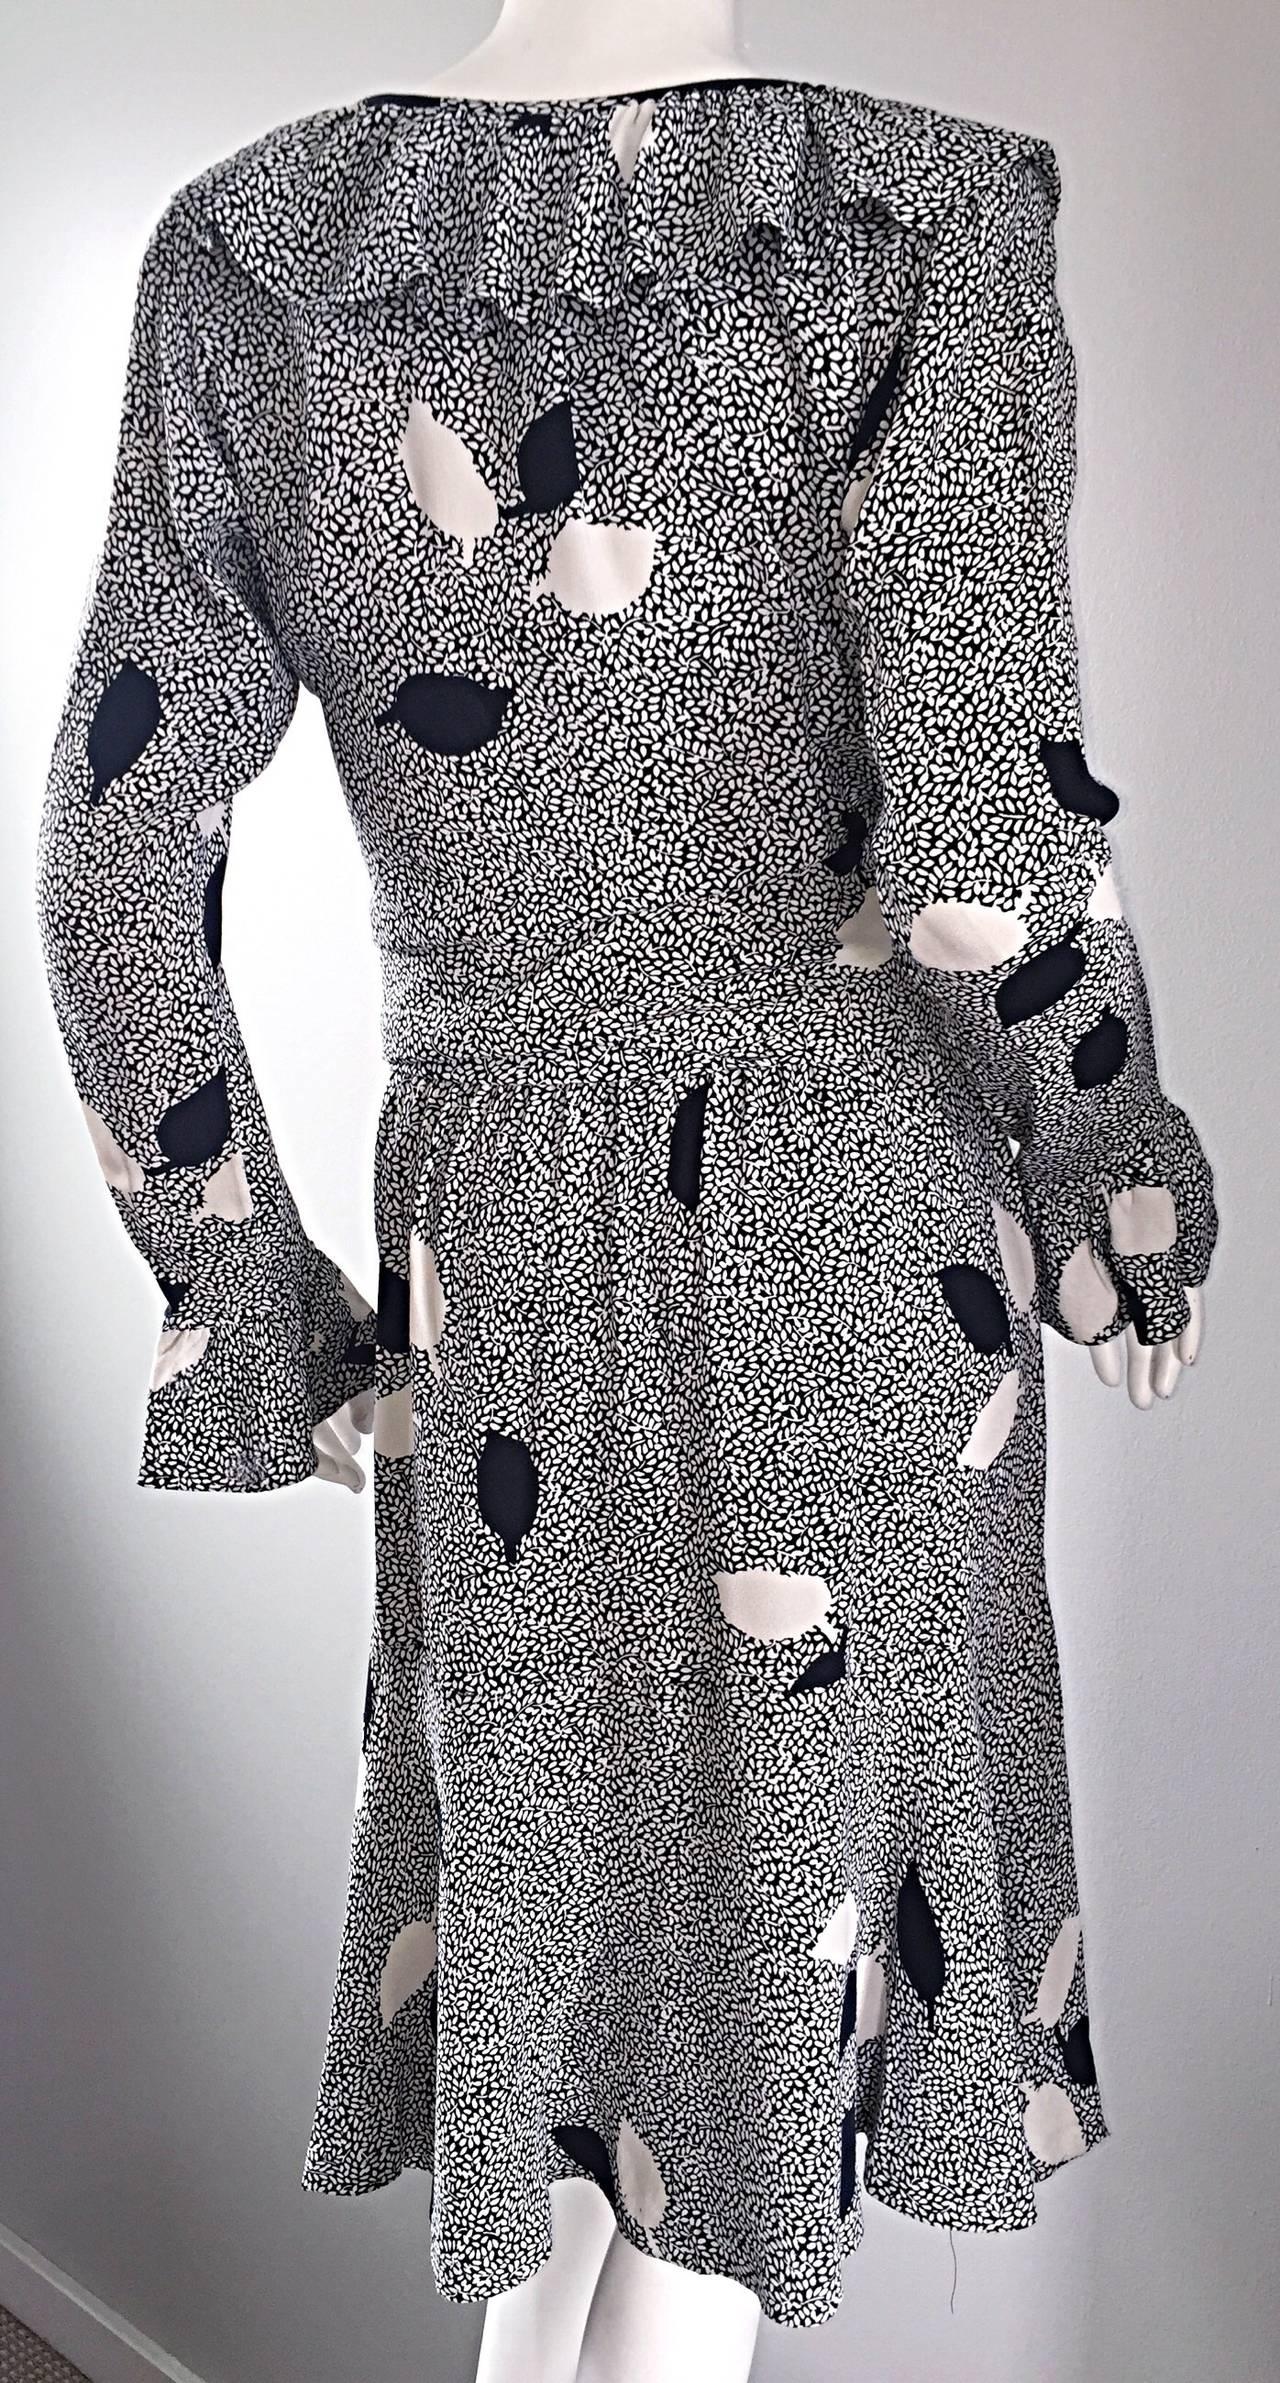 Vintage Yves Saint Laurent 1980s ' Rive Gauche ' Black + White Leaf Dress & Sash In Excellent Condition For Sale In Chicago, IL